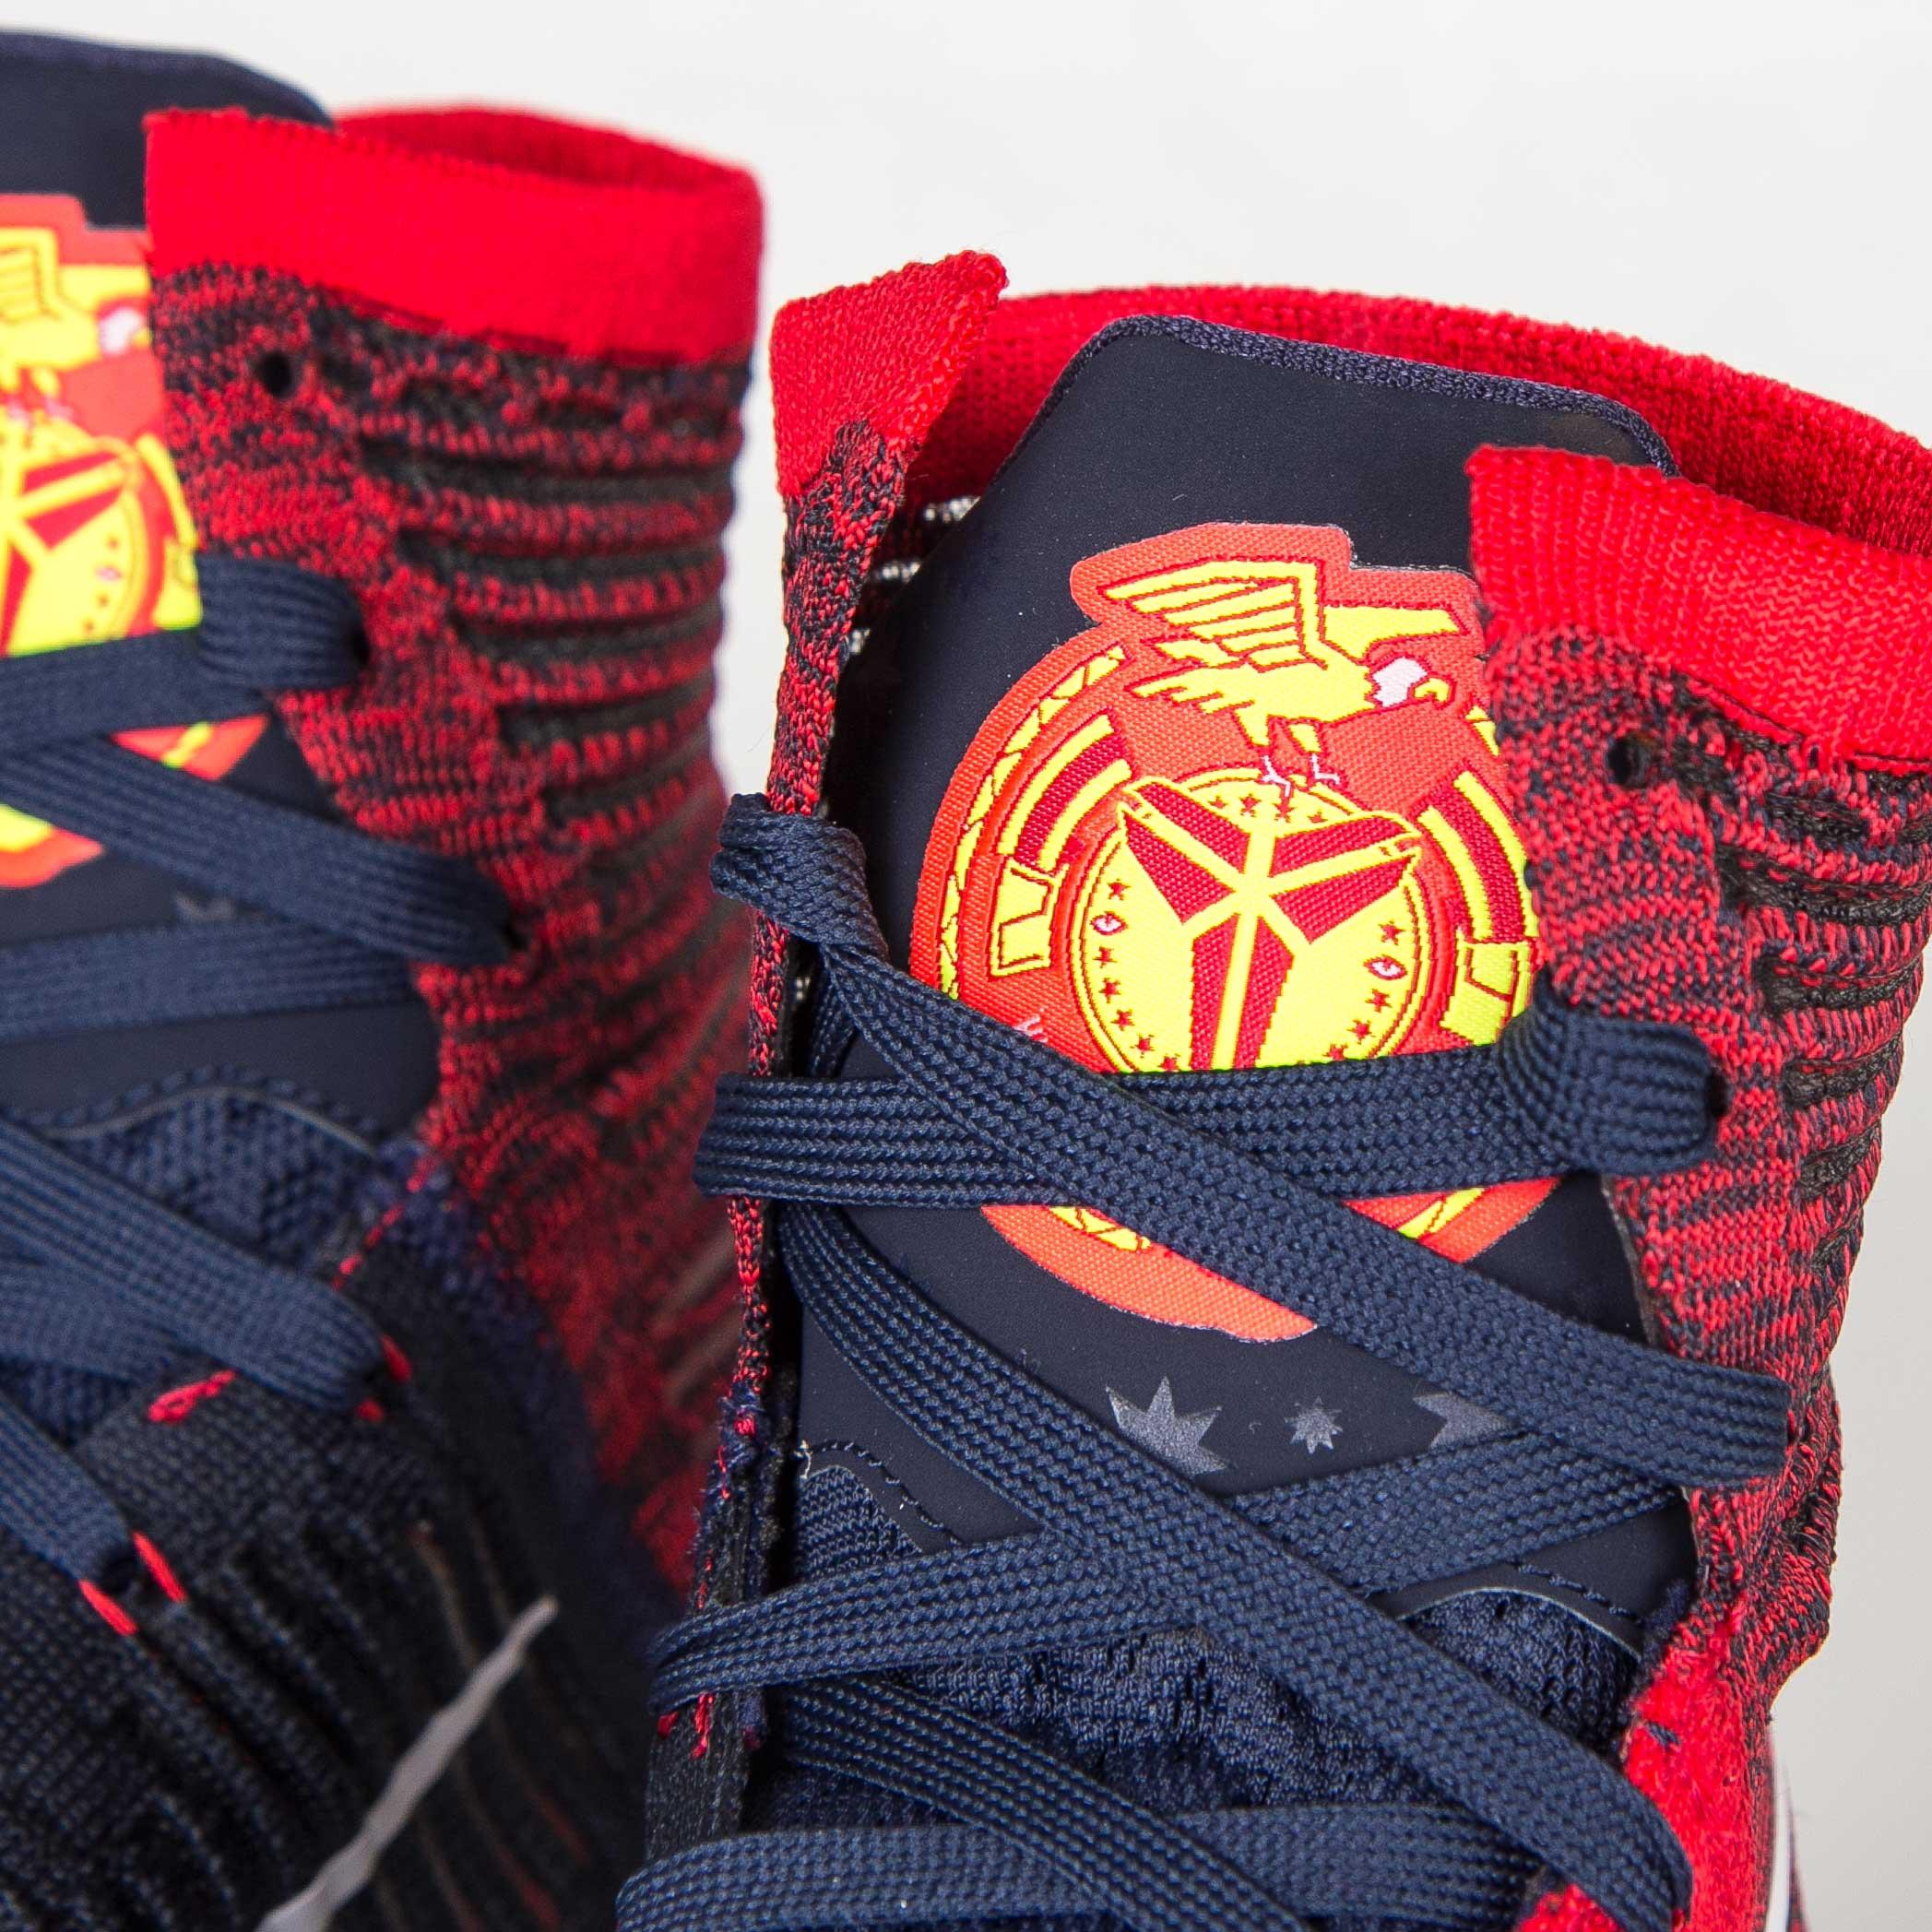 buy online 997cb f8a9d Nike Kobe X Elite - 7. Close